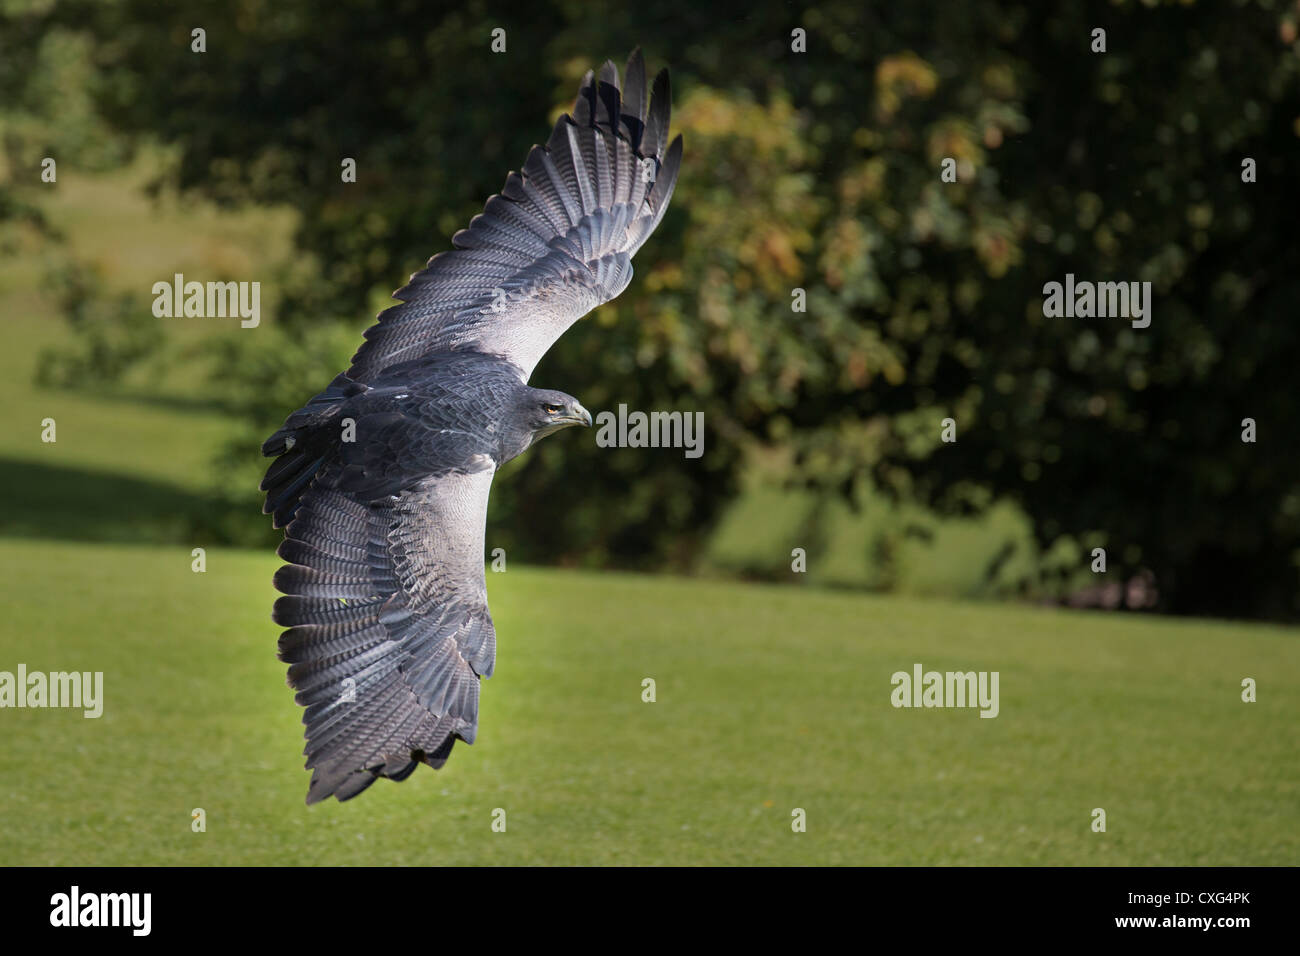 Grey Buzzard Eagle (Chilean Blue Eagle, Black-chested Buzzard Eagle) - Stock Image